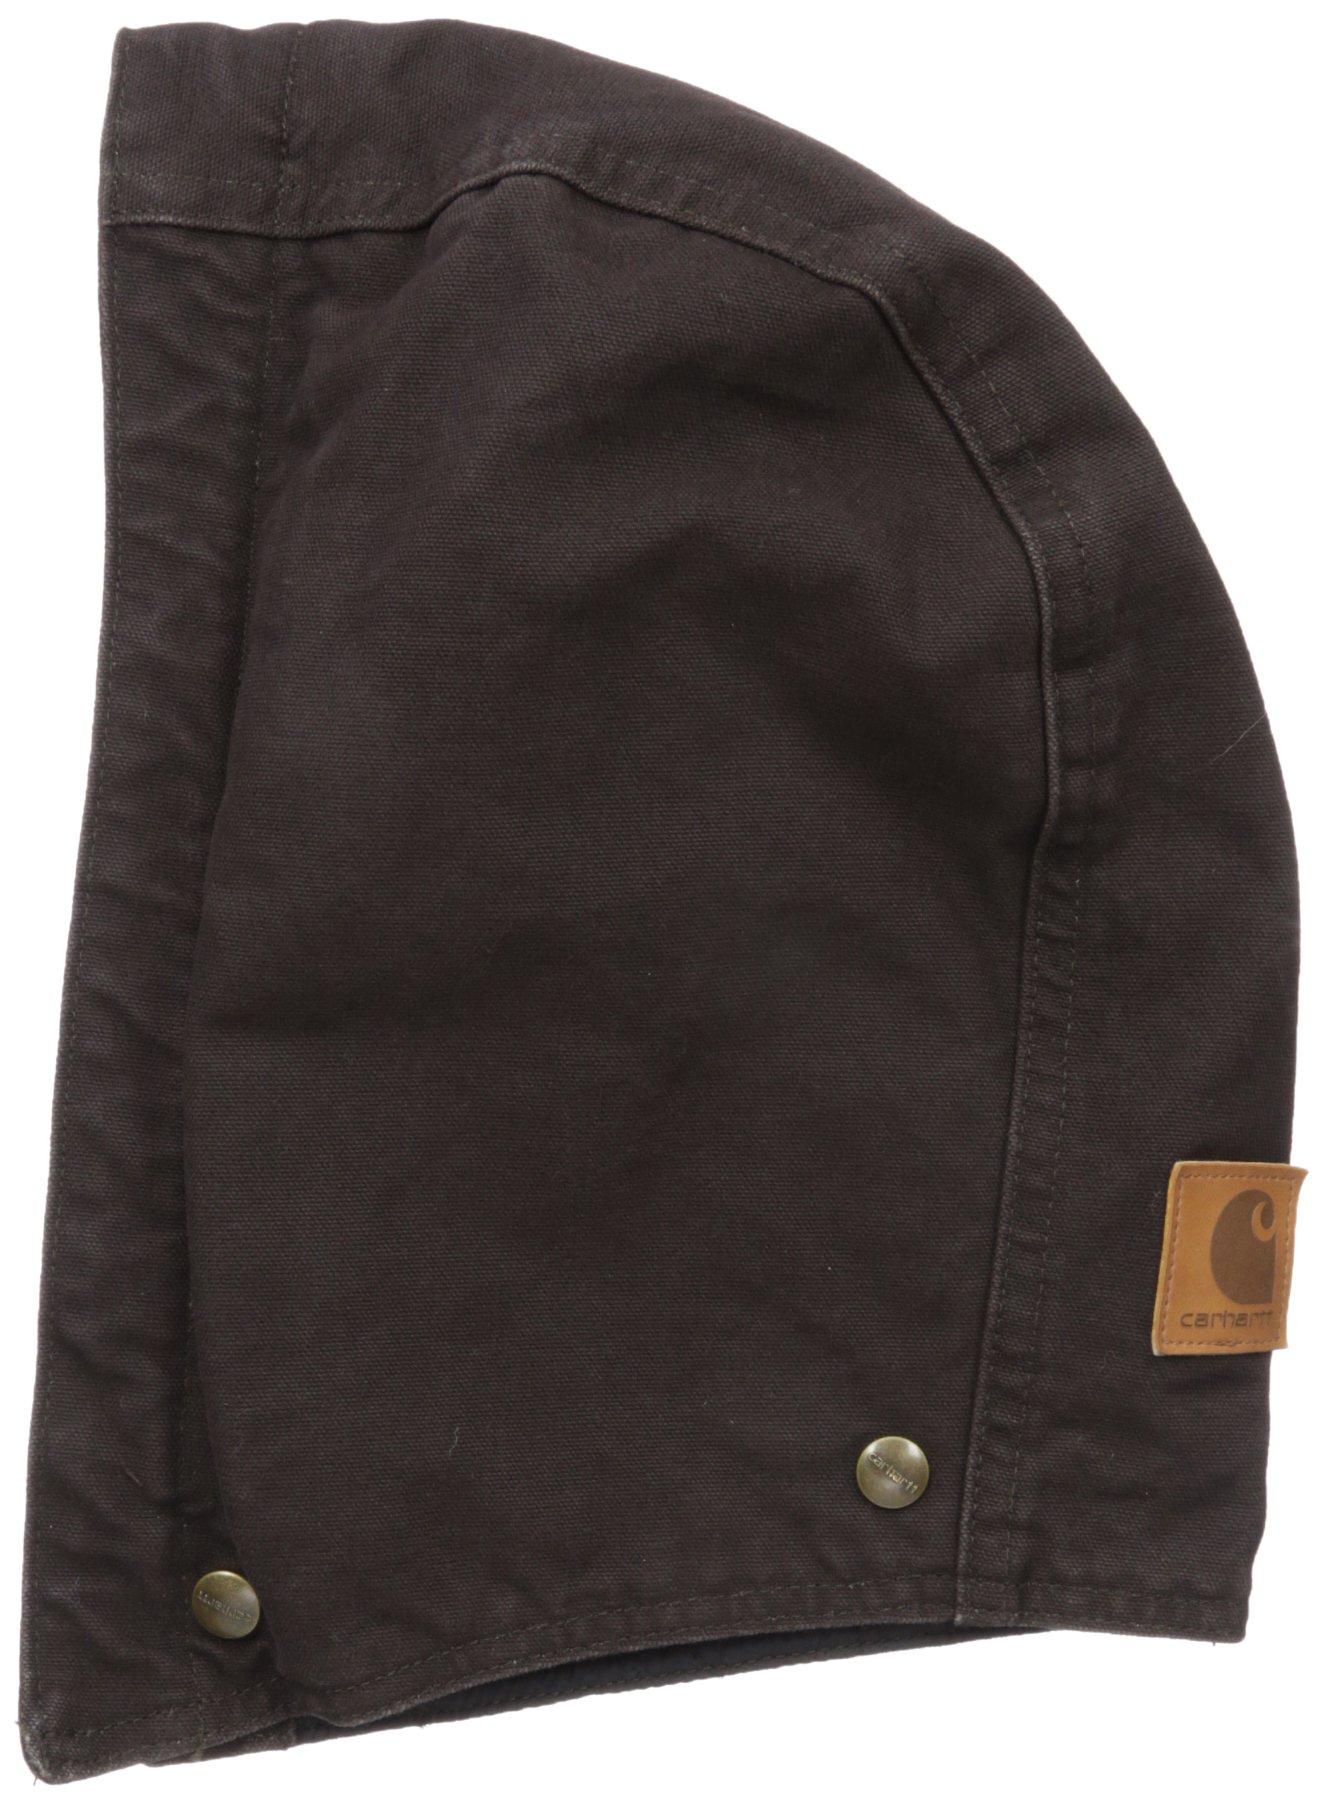 Carhartt Men's Quilt-Lined Sandstone Hood, Dark Brown, SM-XL